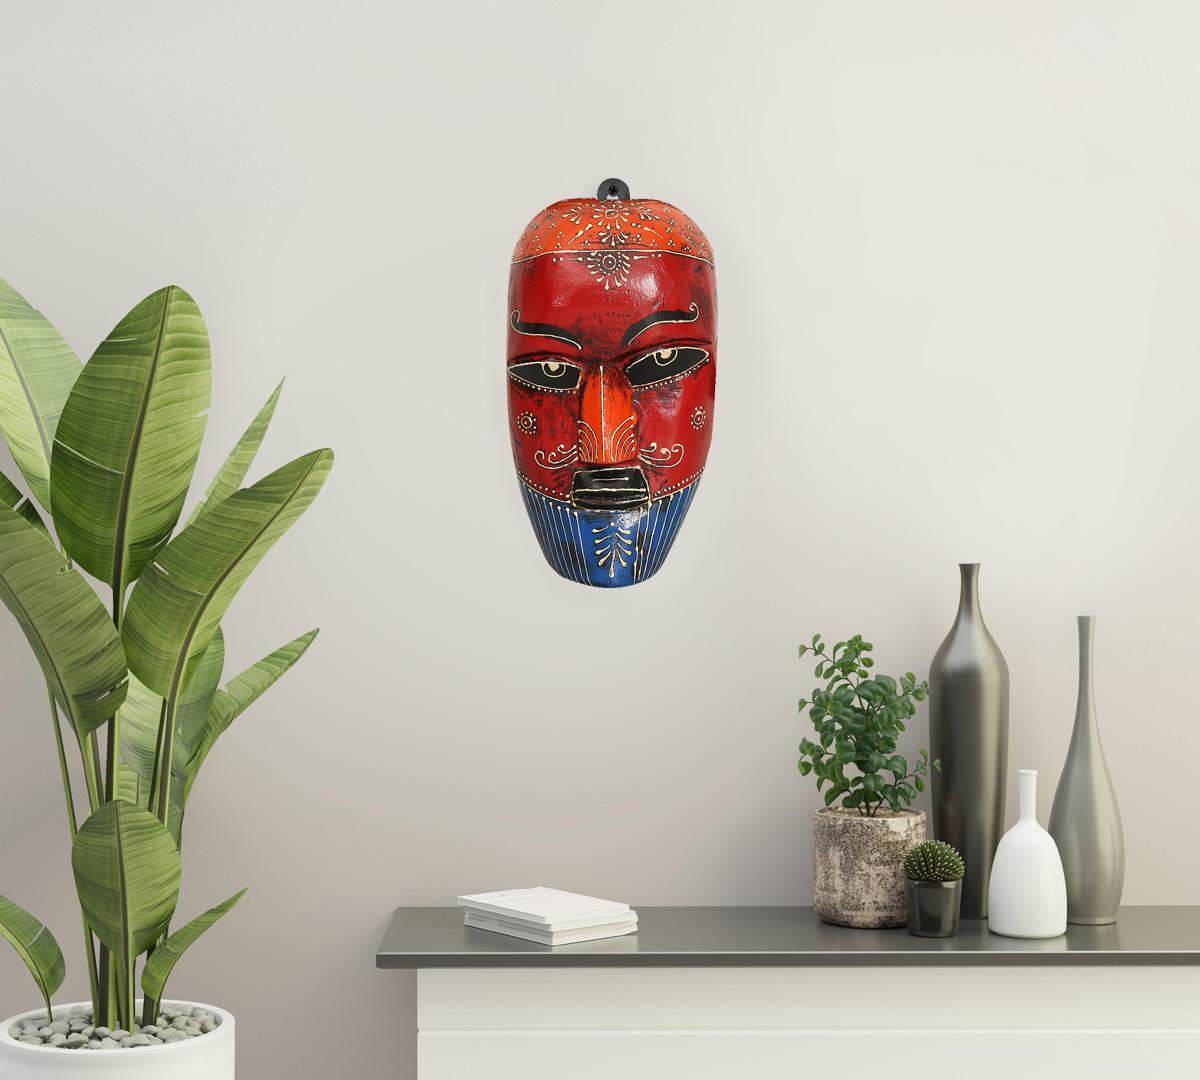 Cardinal Nymph Decorative Wooden Mask